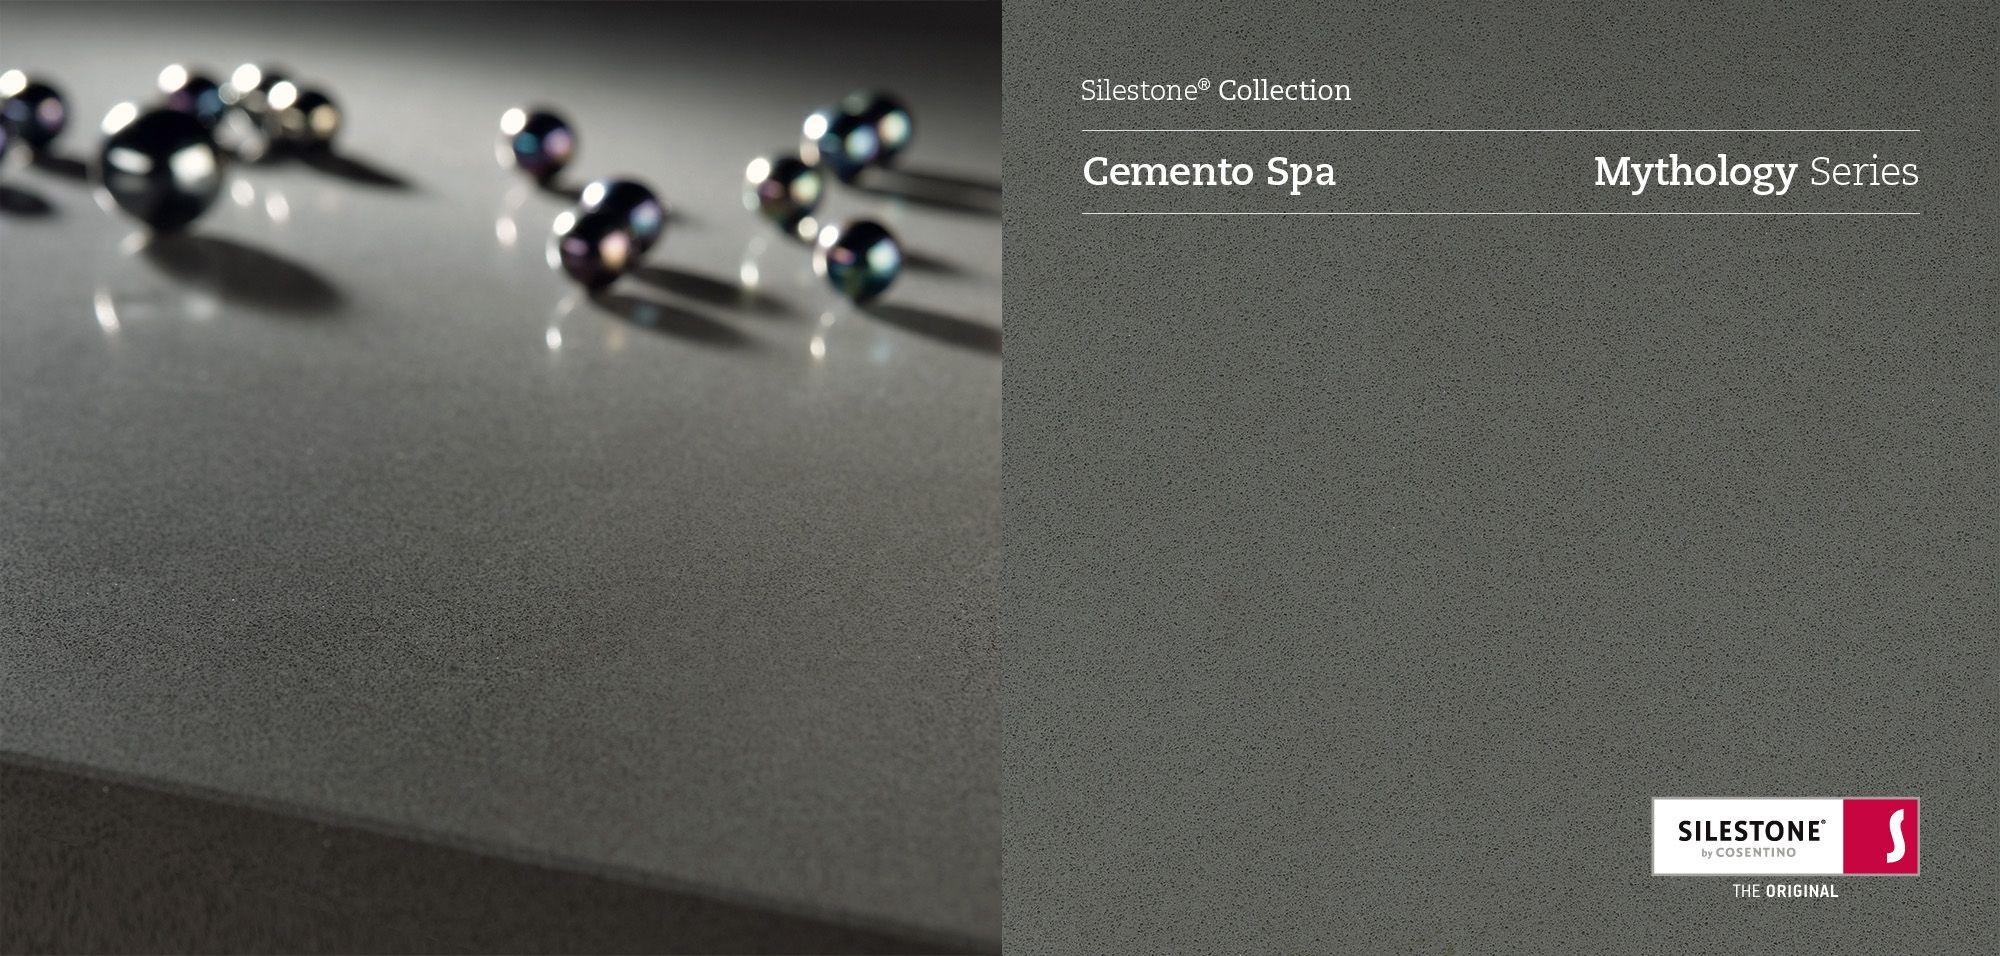 Silestone cemento spa silestone collection pinterest - Silestone cemento spa ...